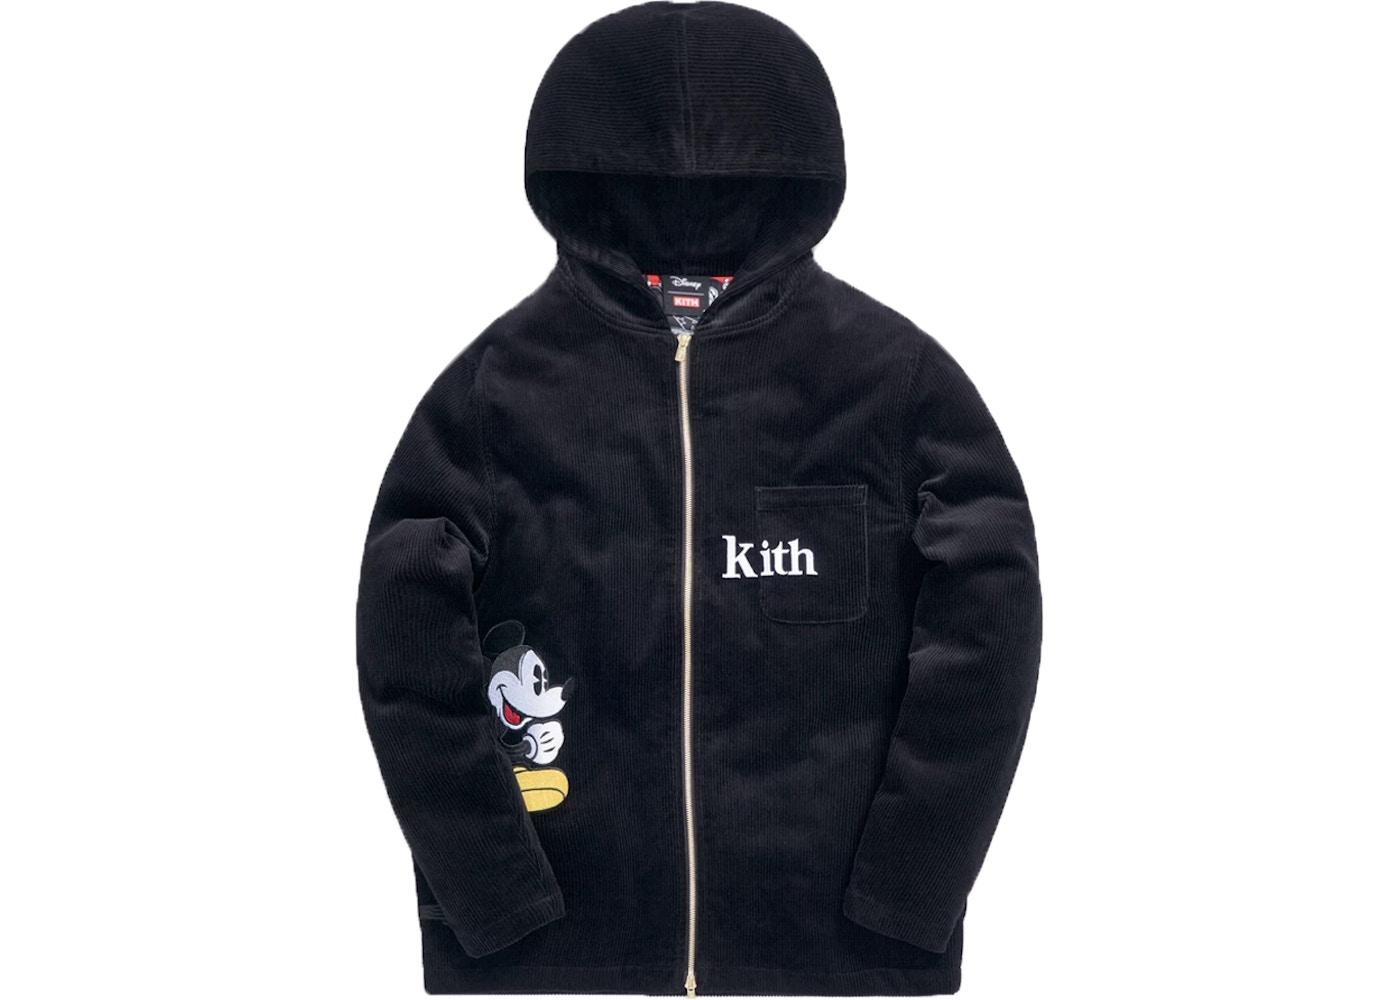 Kith x Disney Carlton Corduroy Zip Hoodie Black